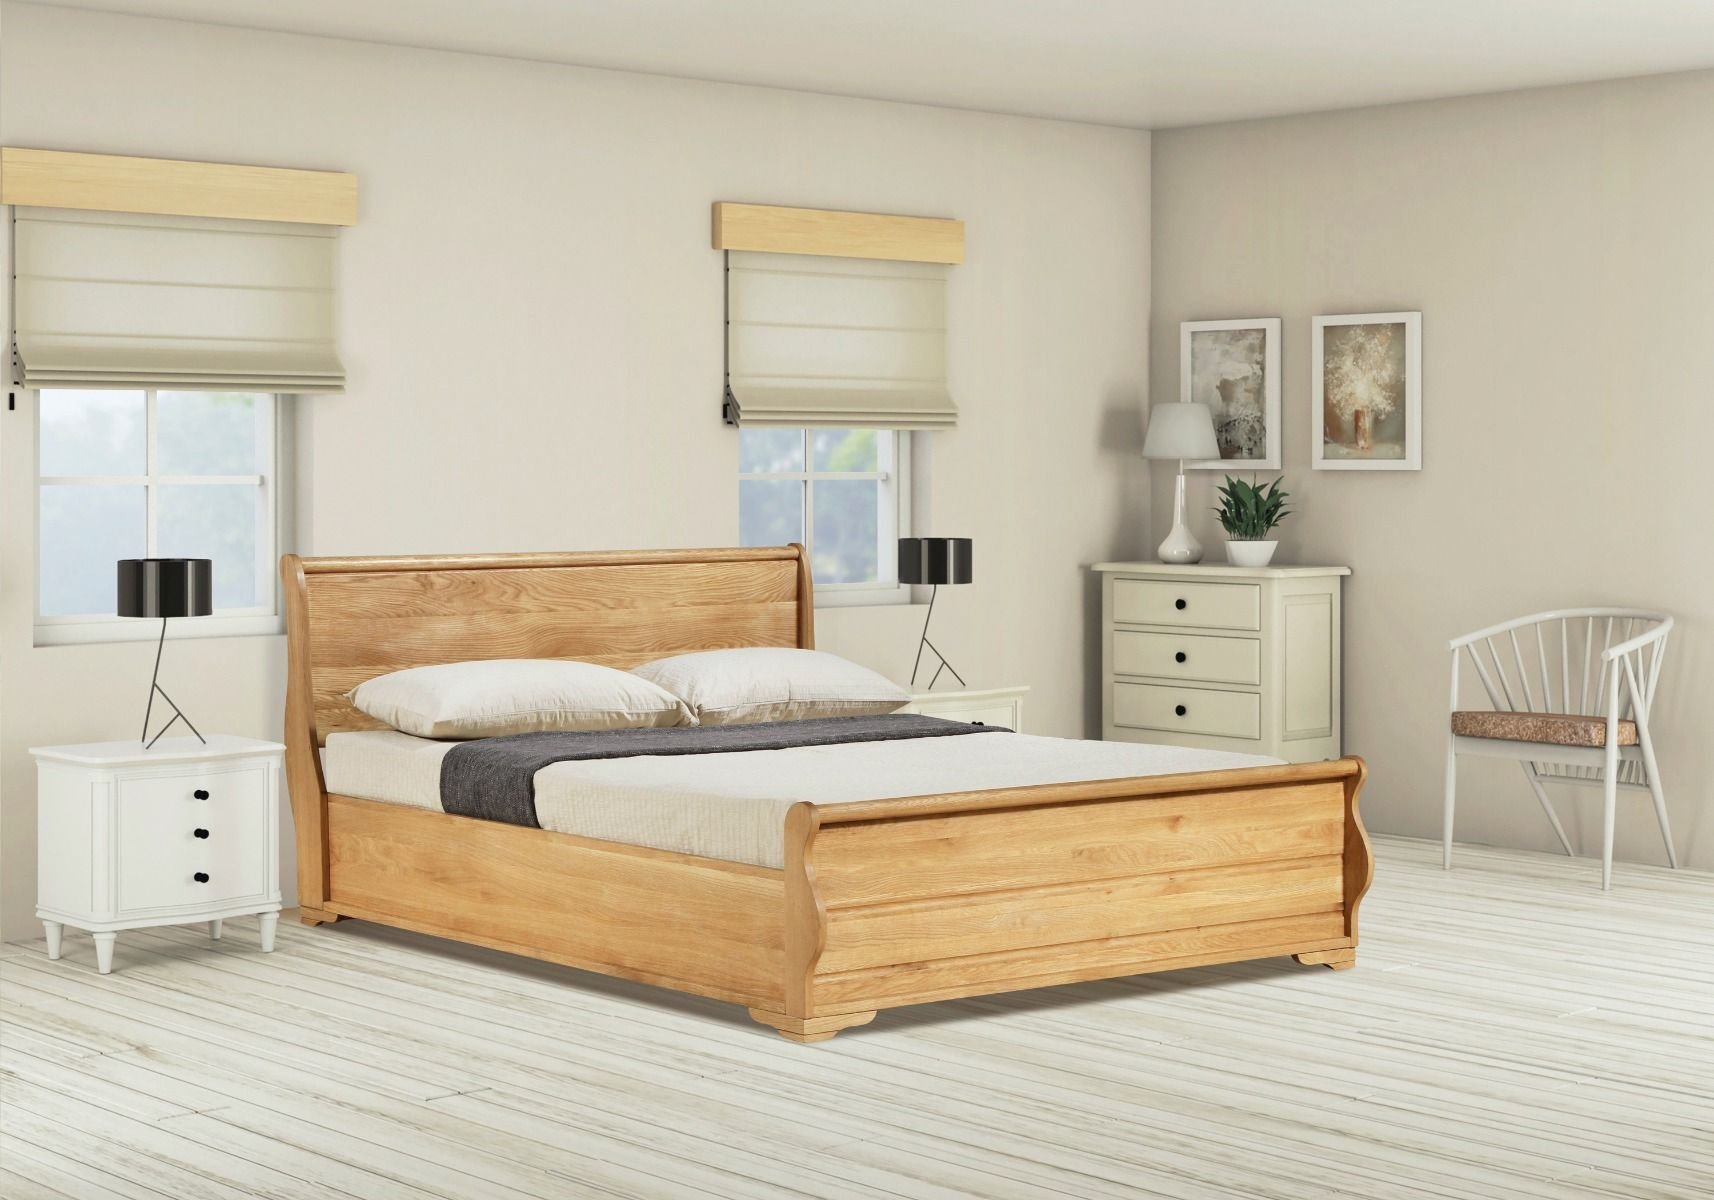 Emporia Beds Windsor Solid Oak Sleigh Ottoman Bed